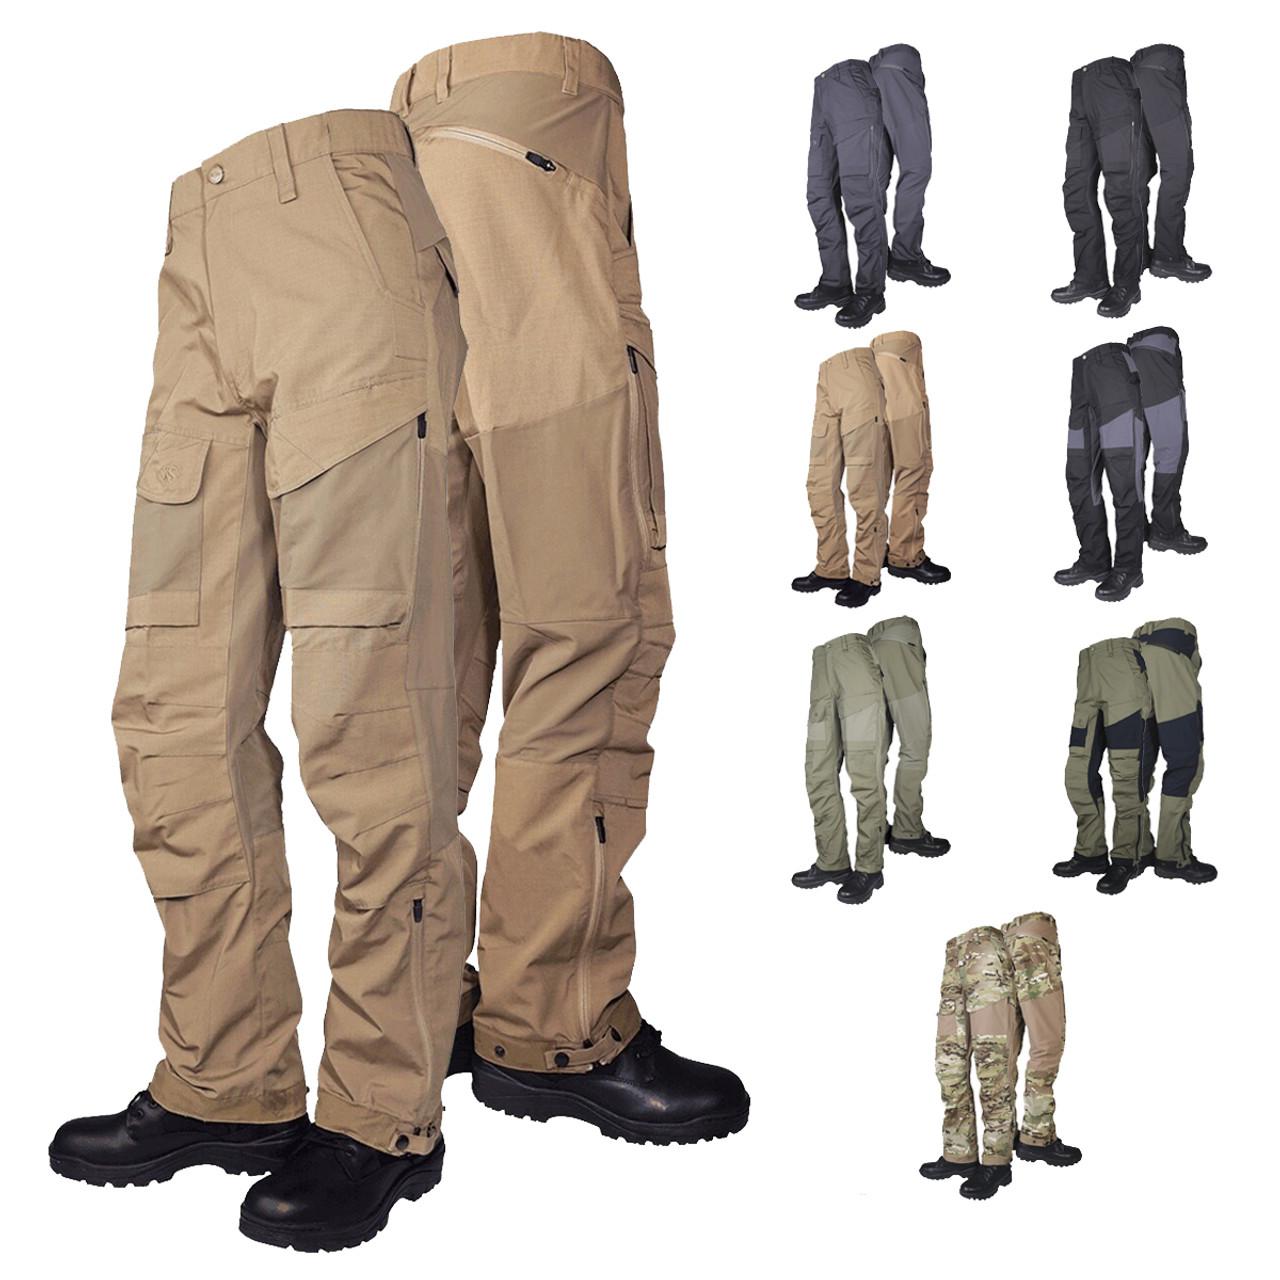 Tru Spec Men S 24 7 Series Polyester Cotton Rip Stop Xpedition Pants